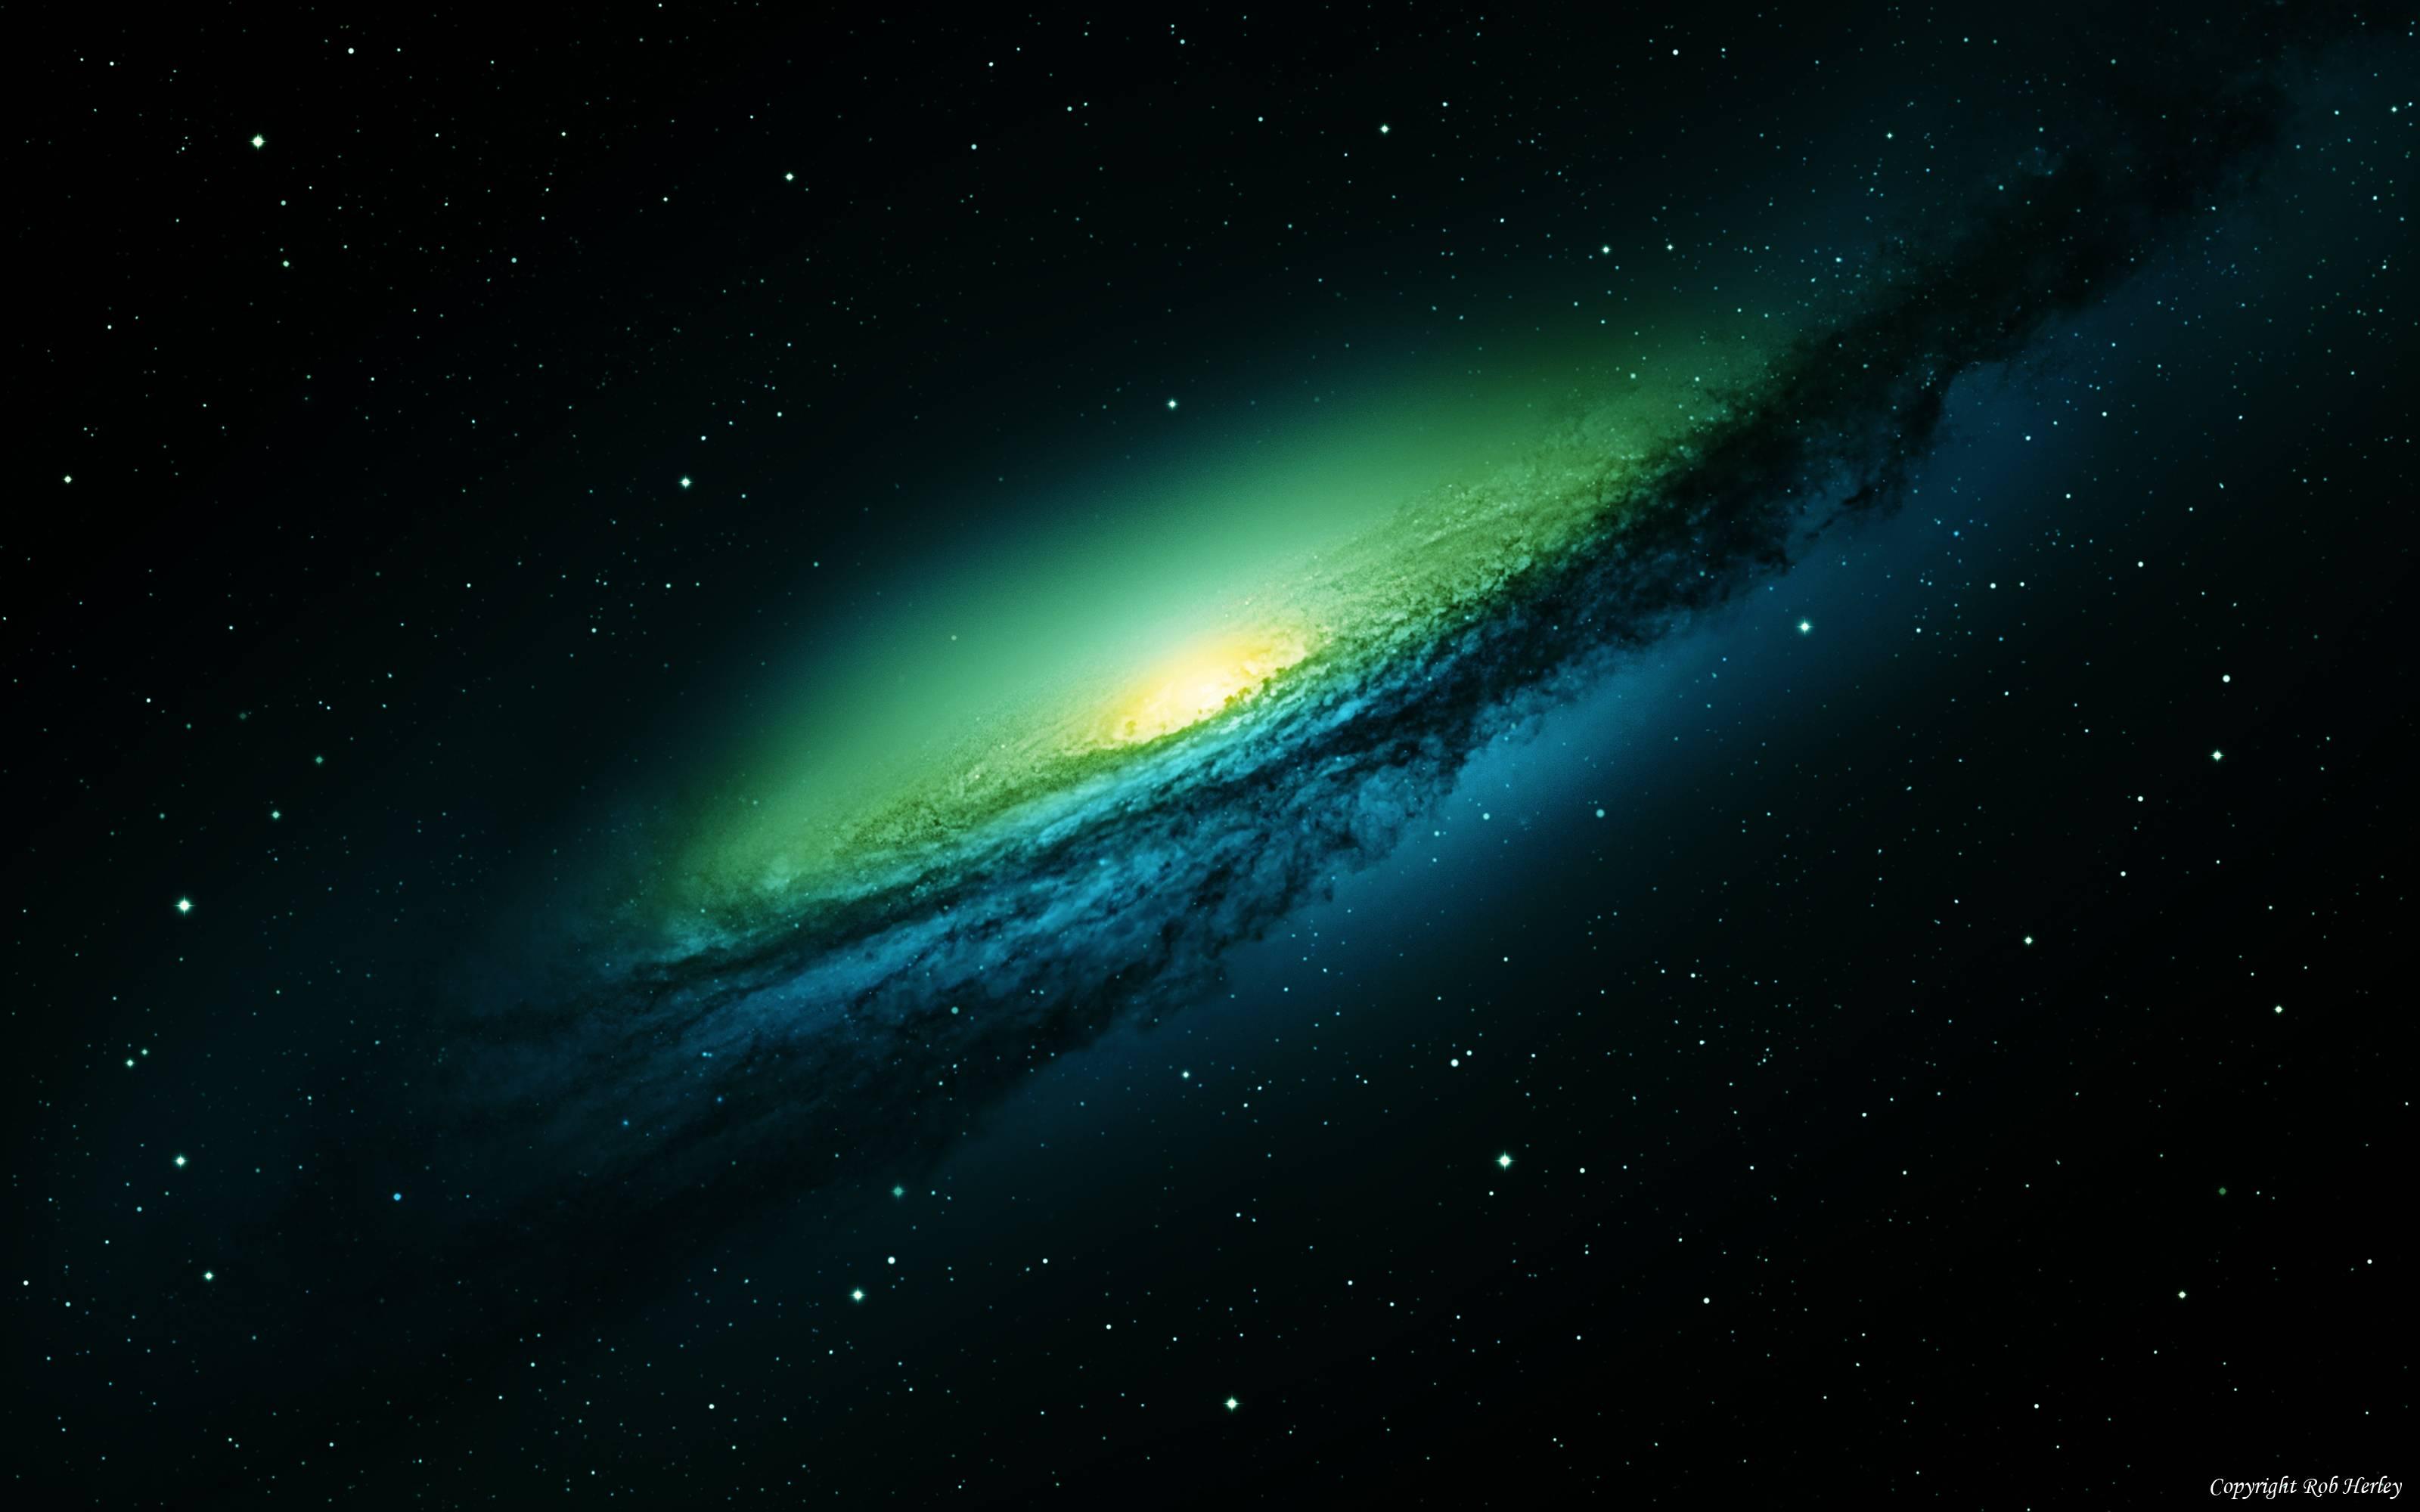 Milky Way Galaxy Wallpapers - Wallpaper Cave